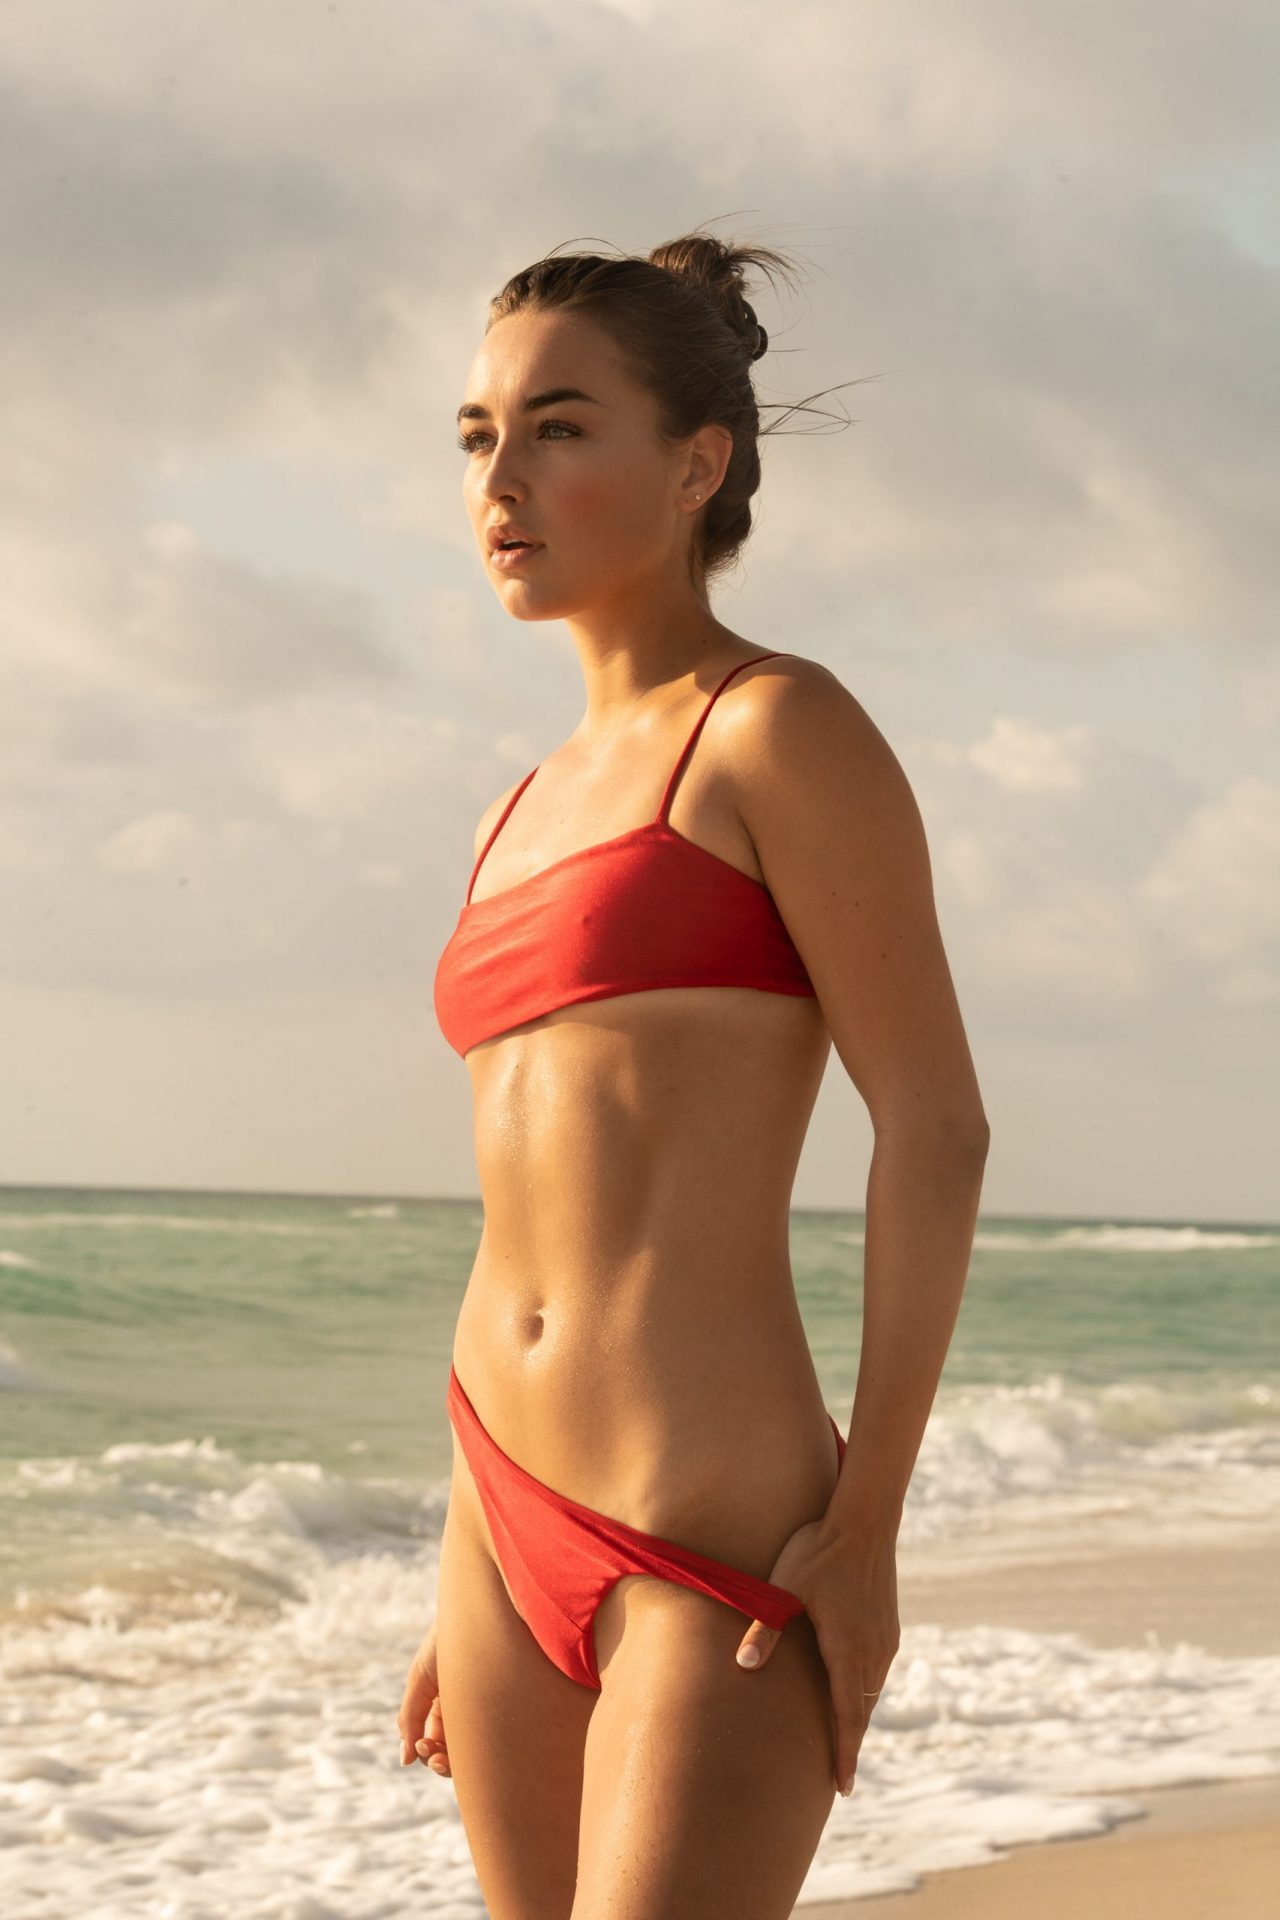 Taylor Bryant in Ley Swimwear